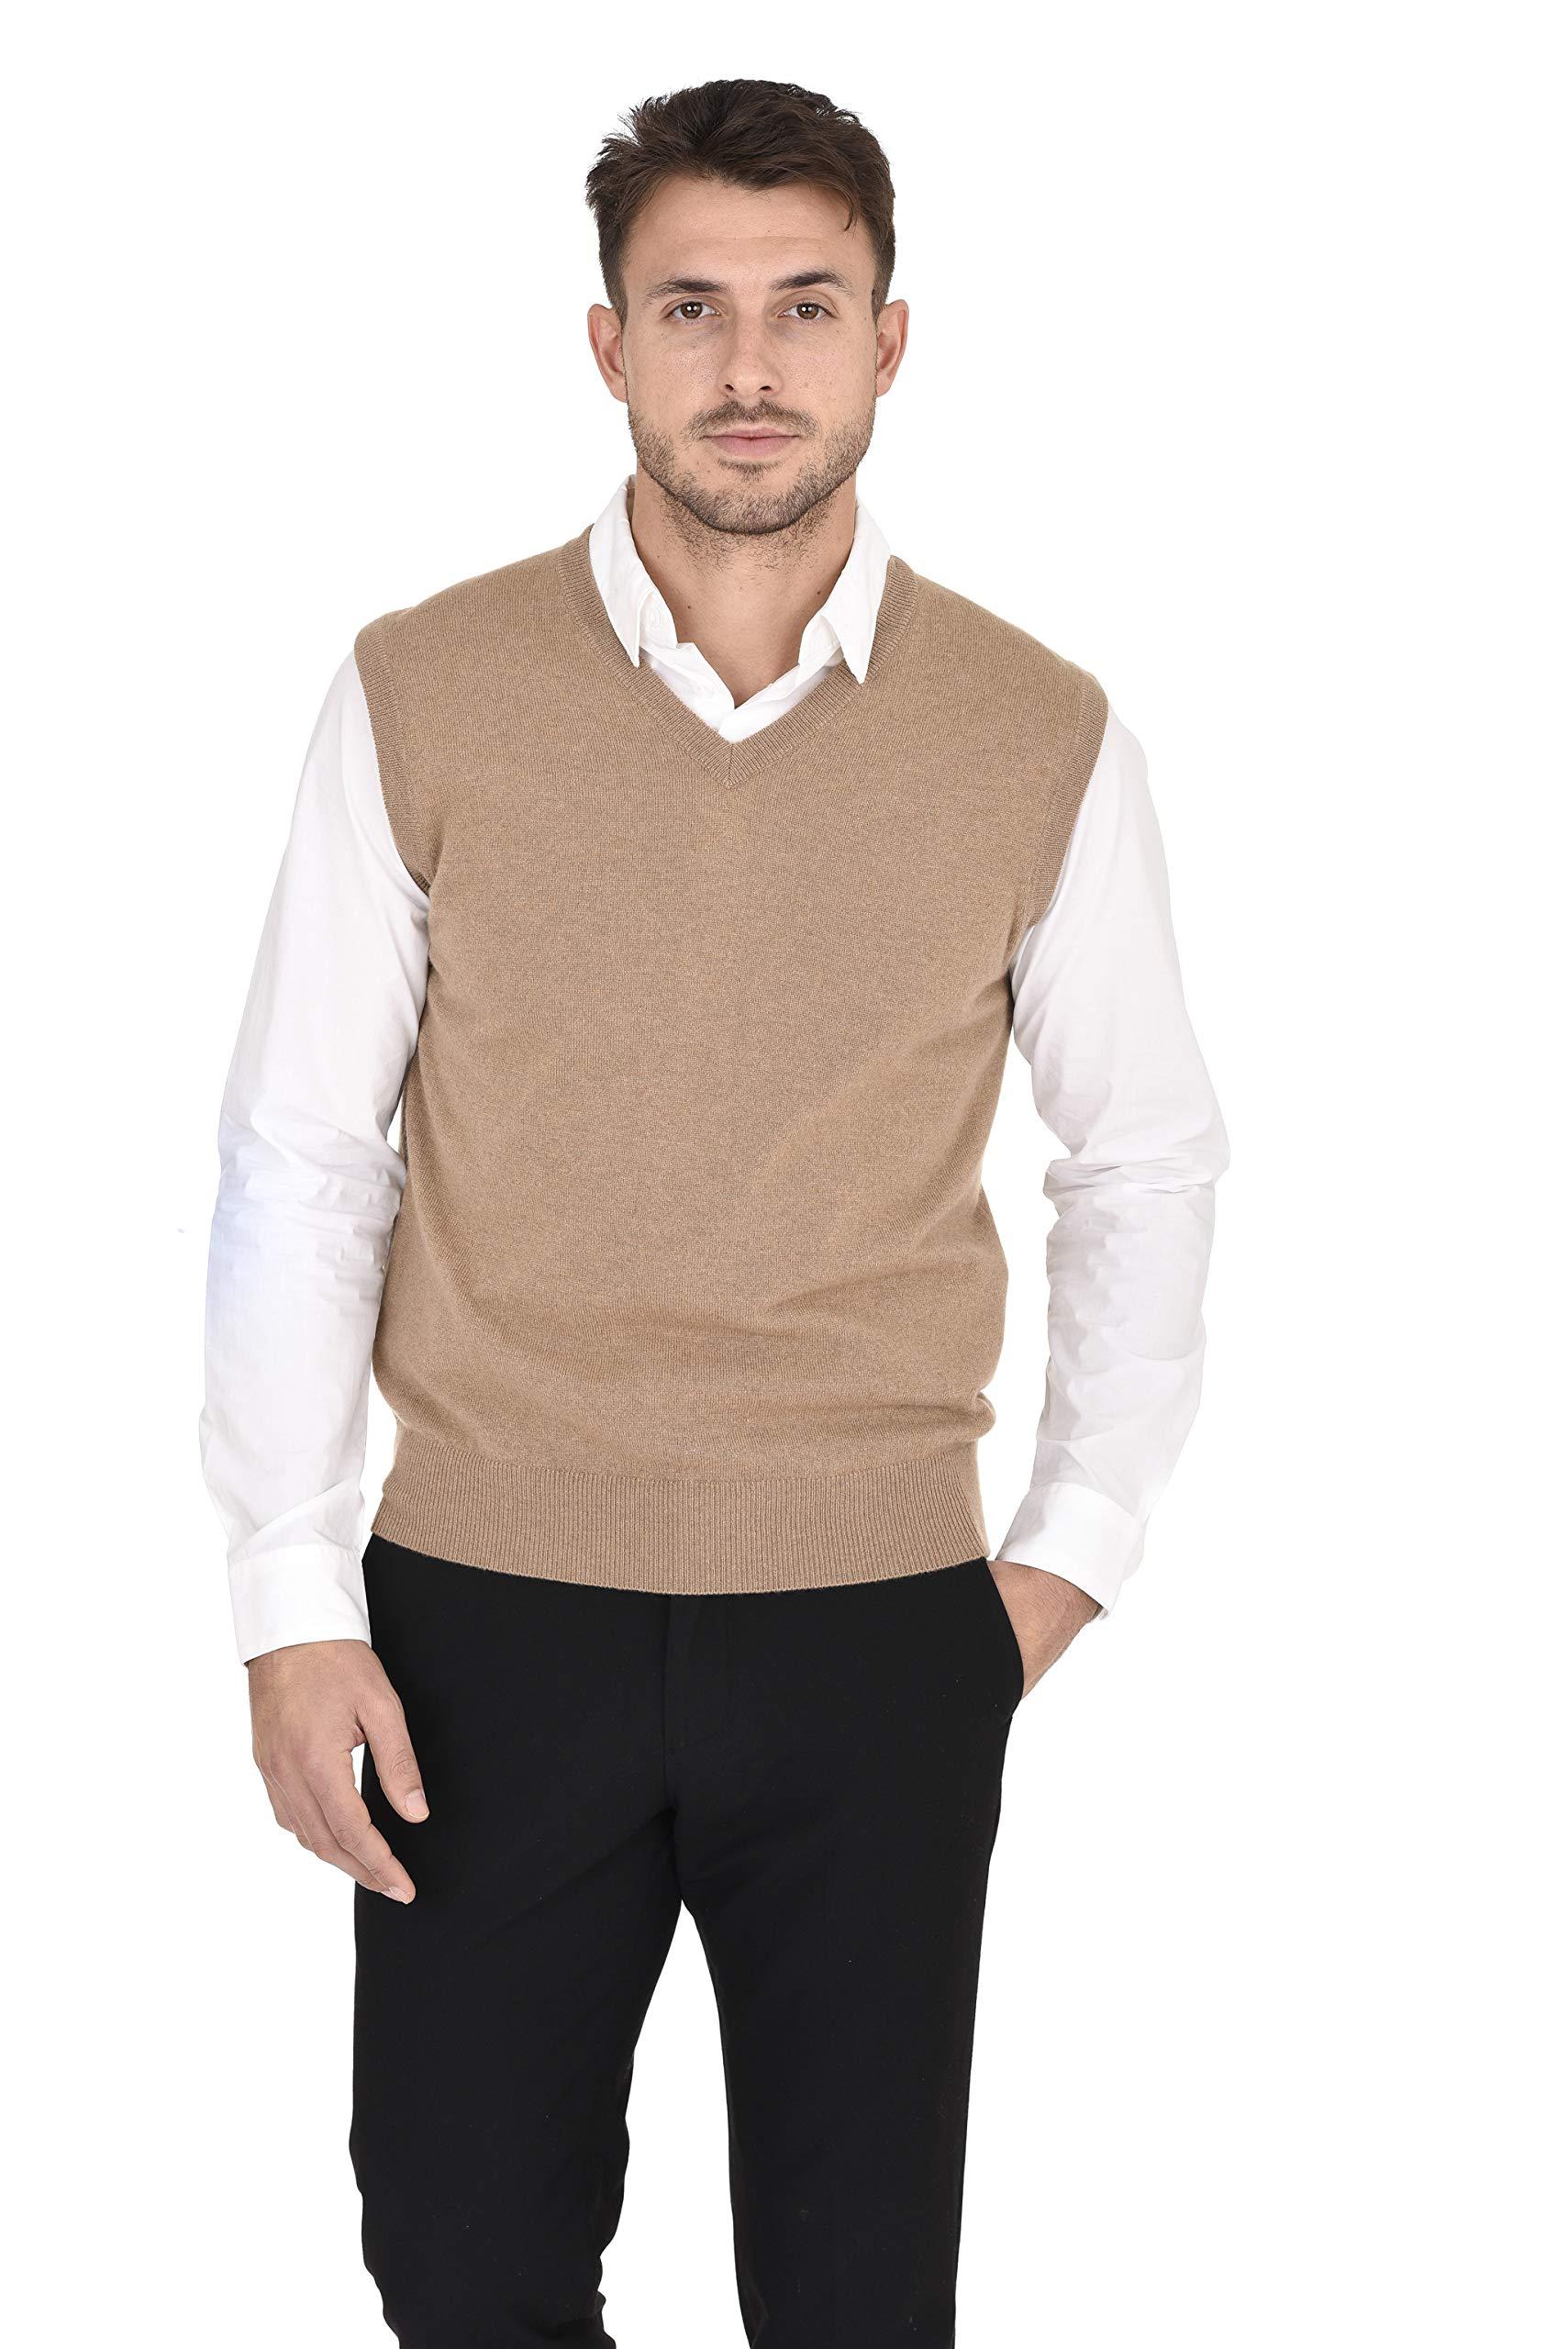 Cashmeren Men's Classic Knit Sleeveless Sweater Vest 100% Pure Cashmere V-Neck Pullover Gilet (Camel, X-Large) by Cashmeren